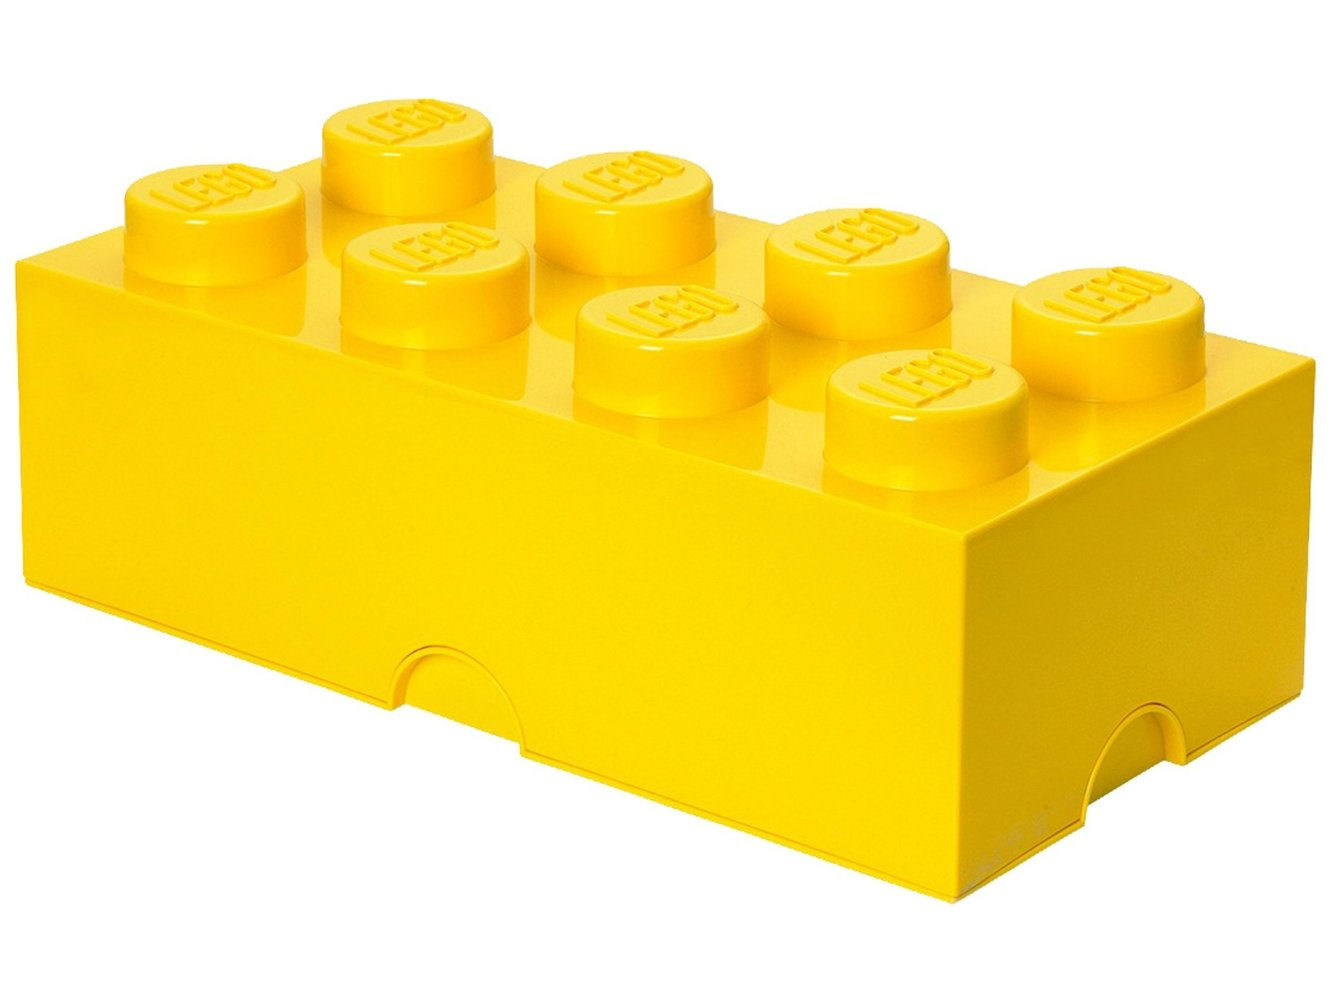 8 stud Yellow Storage Brick